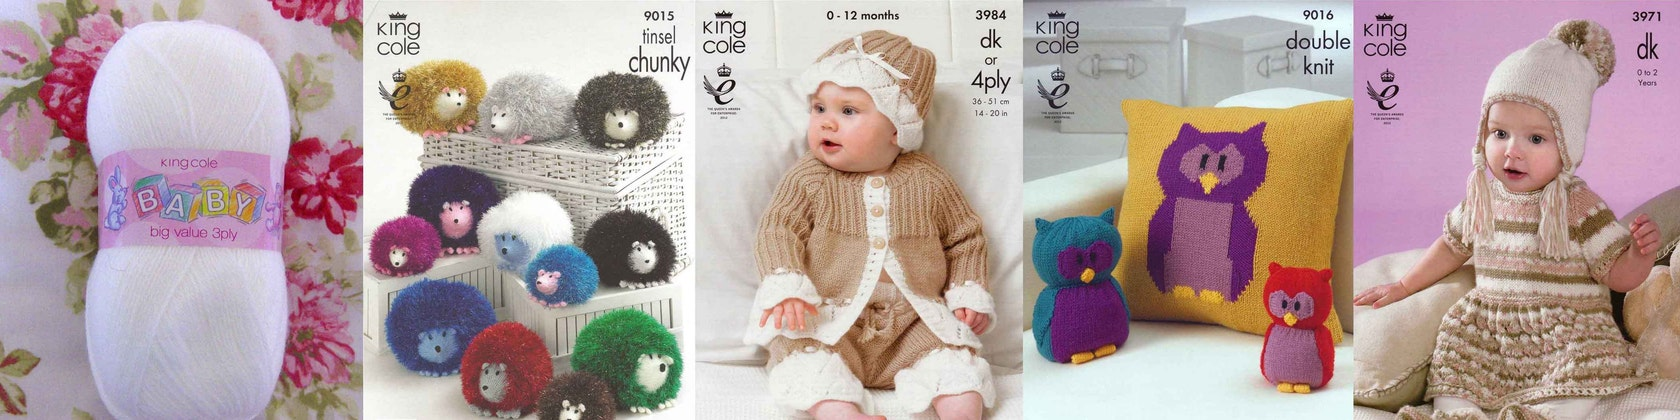 "King Cole Knitting Pattern 2821~Mix /& Match Jackets//Sweaters//Cardigans~DK~12-24/"""